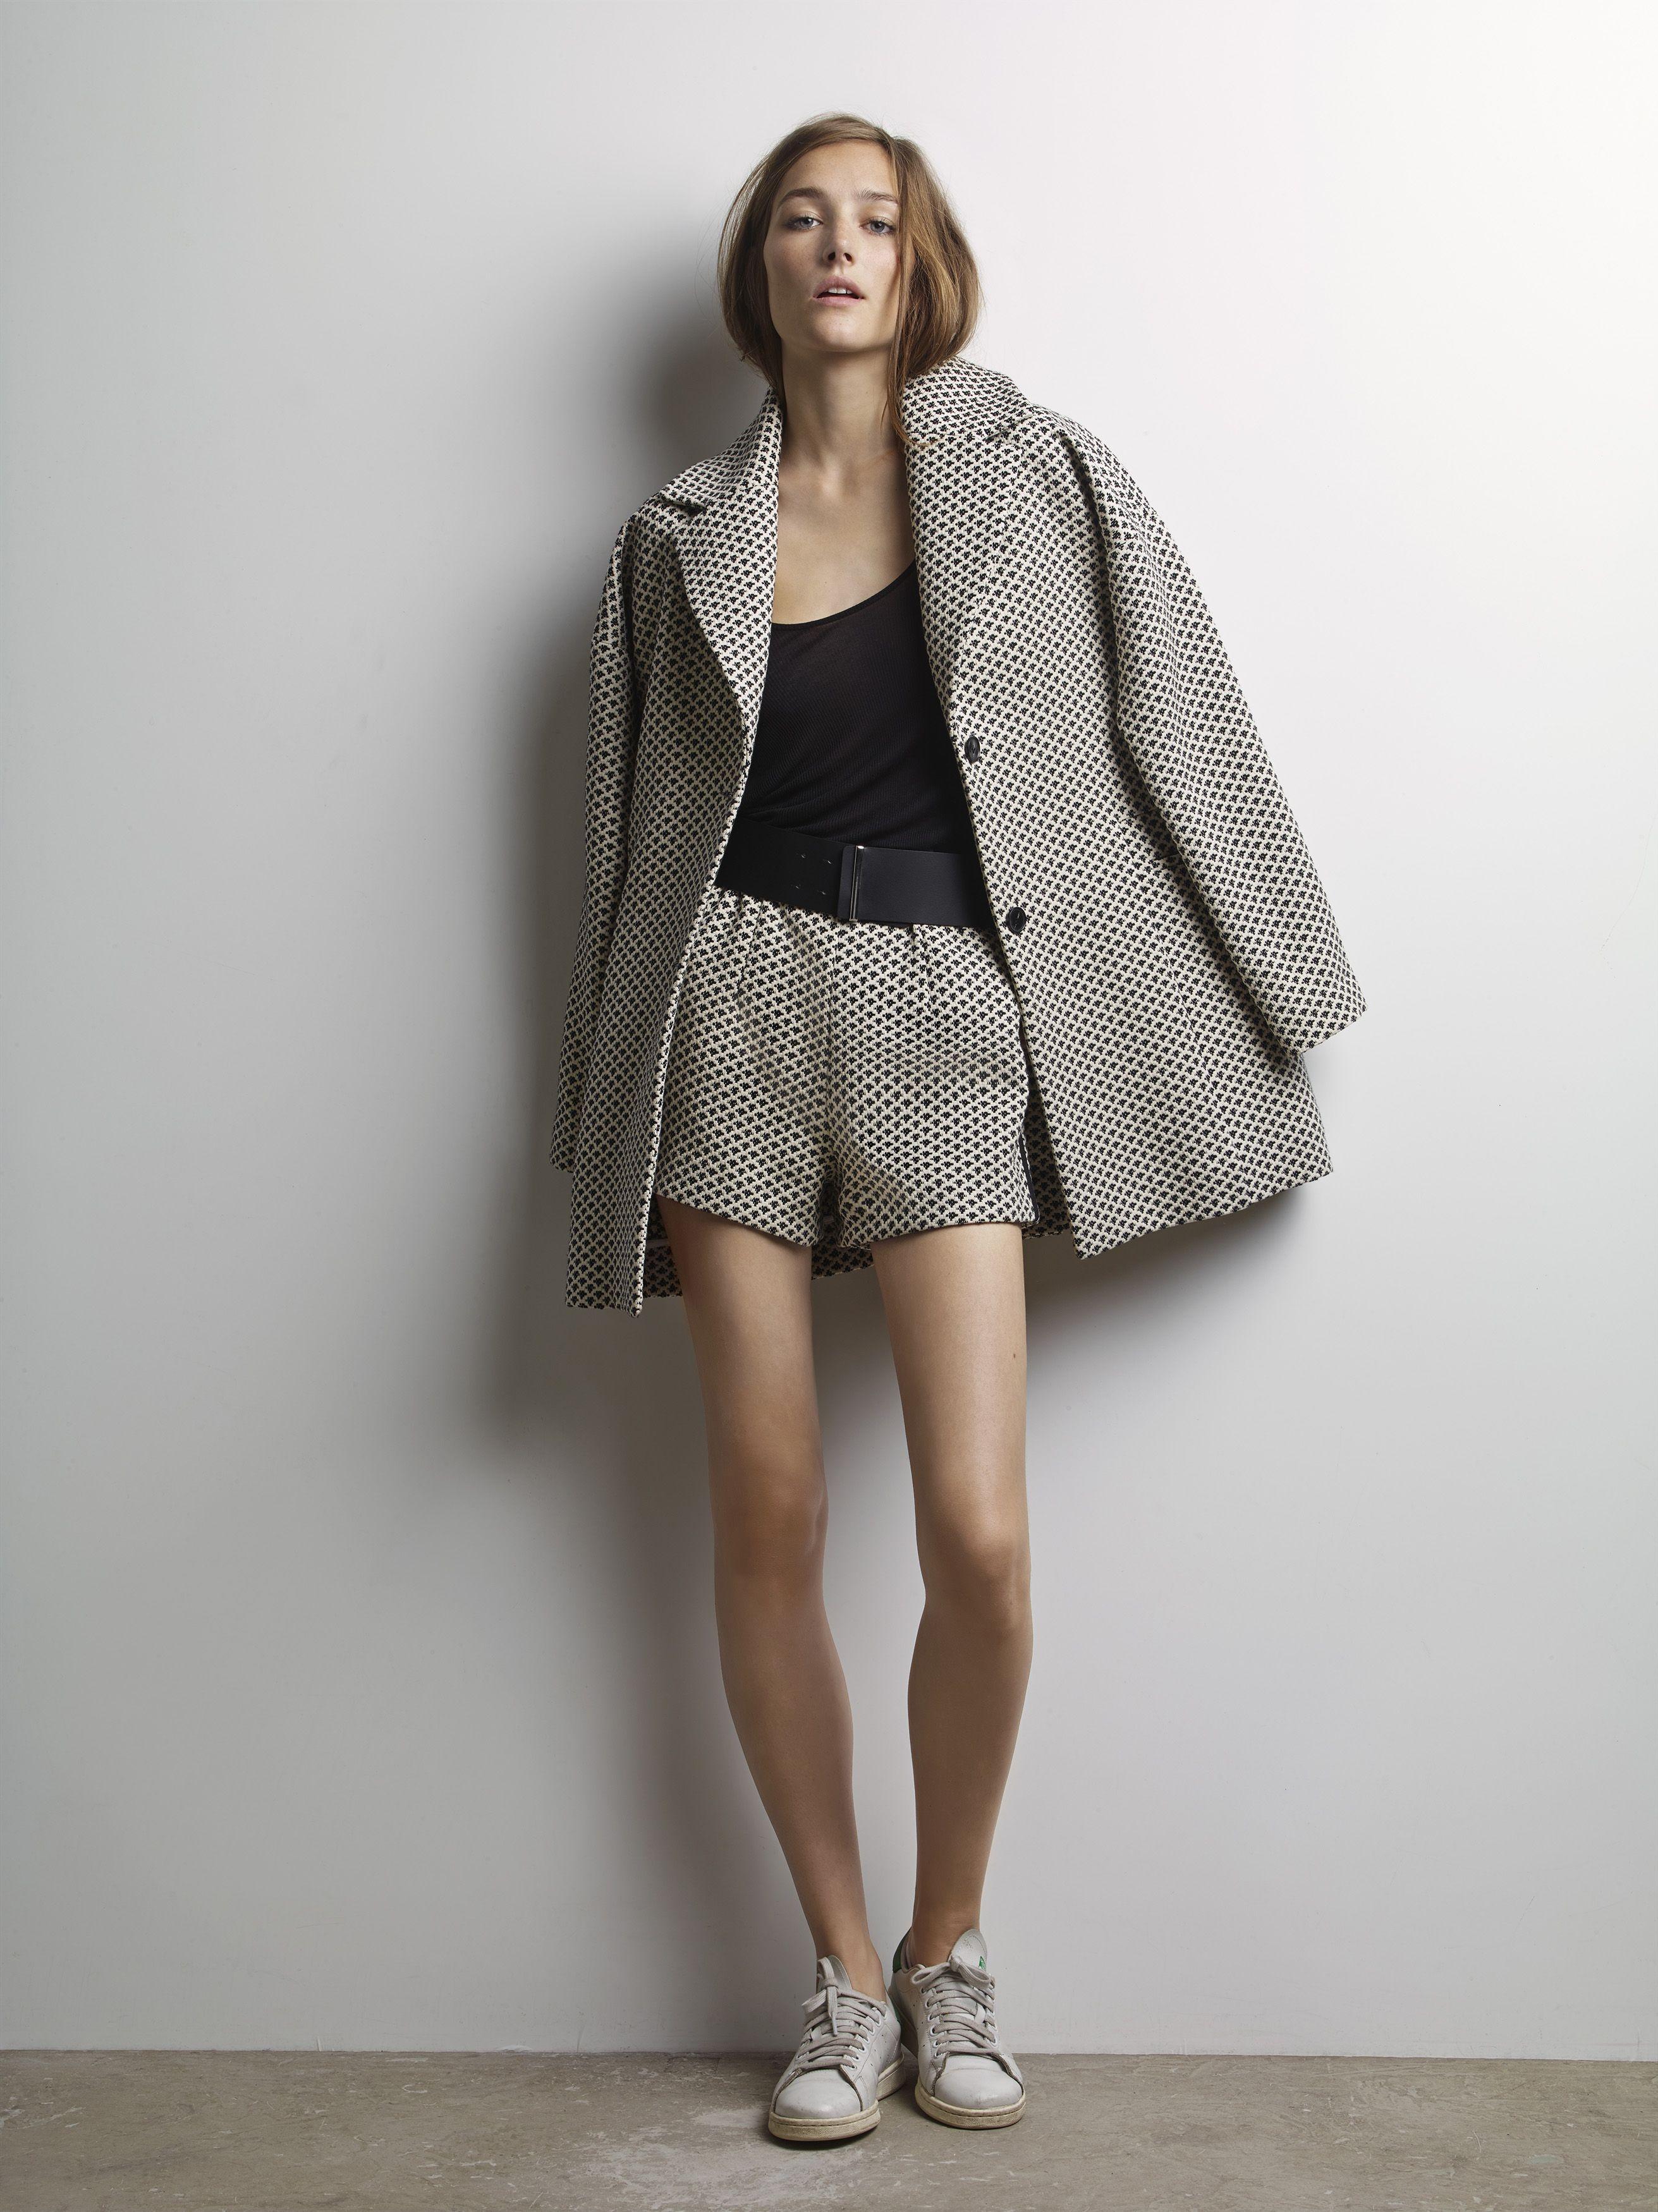 #lookbook #photographerFredMeylan #modelJosephineLeTutour #elite model #bashparis #SS15 #springsummer #collection